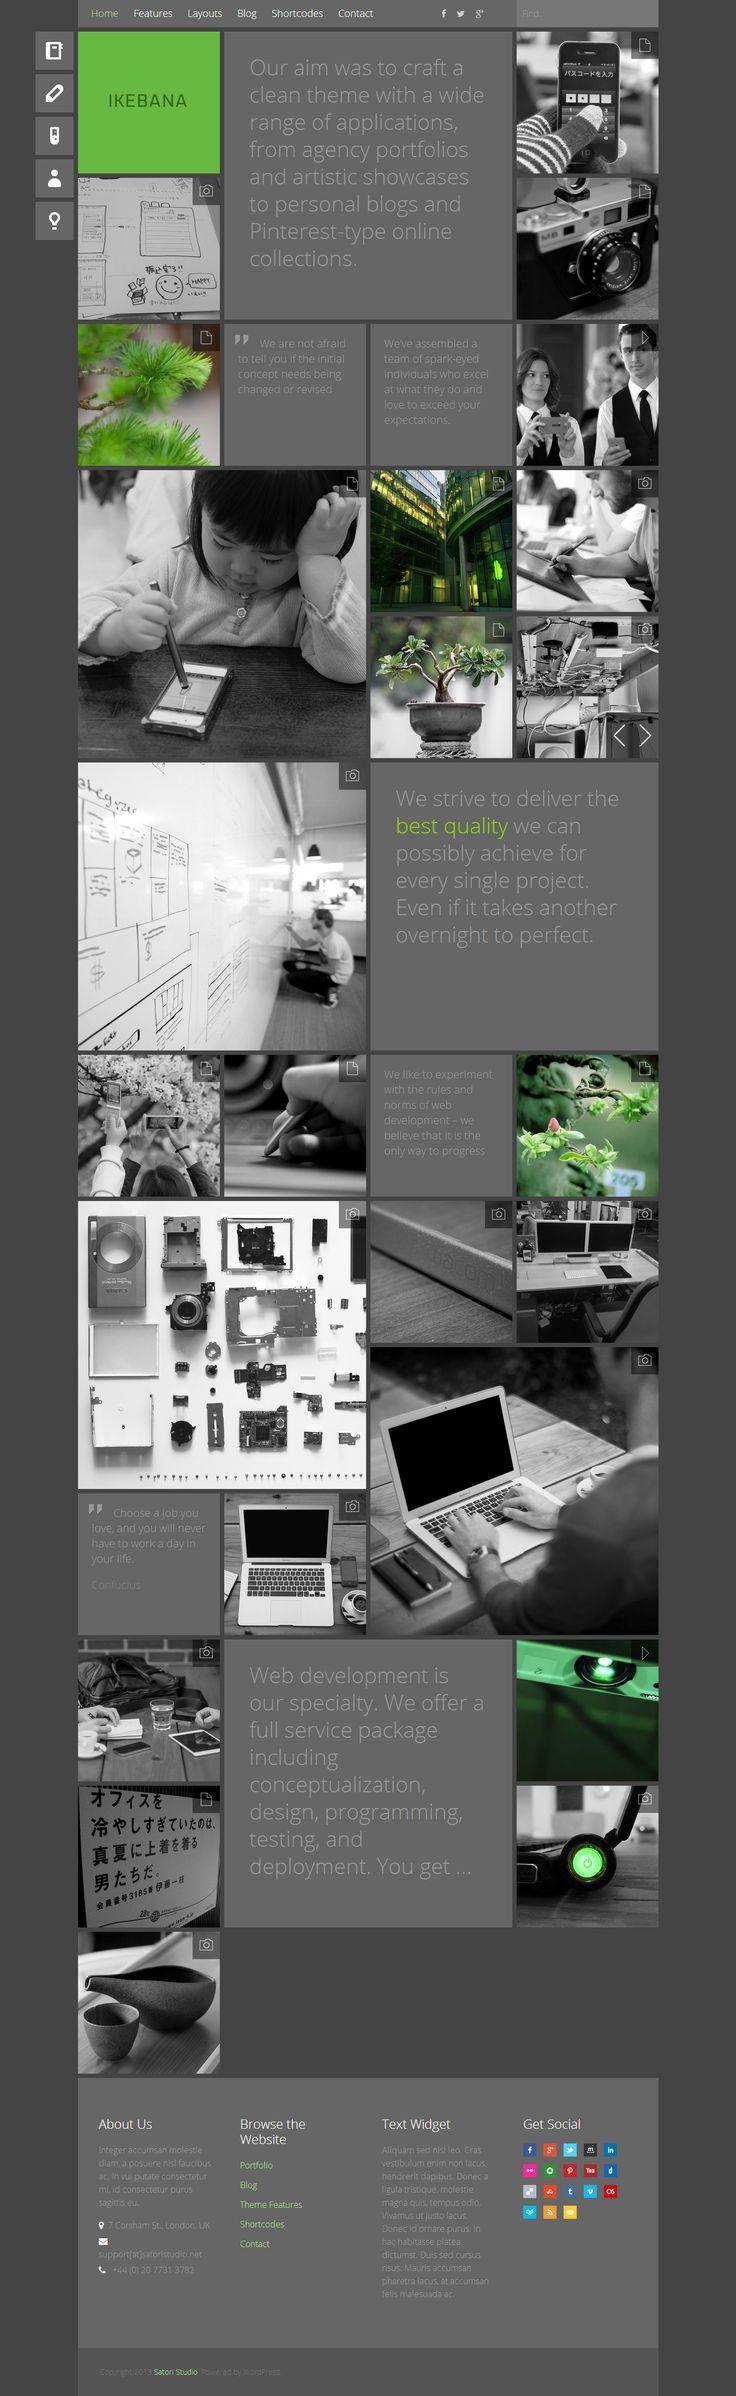 Ikebana - Masonry WordPress Portfolio Theme http://themeforest.net/item/ikebana-masonry-wordpress-portfolio-theme/5295994?ref=wpaw #web #design #wordpress